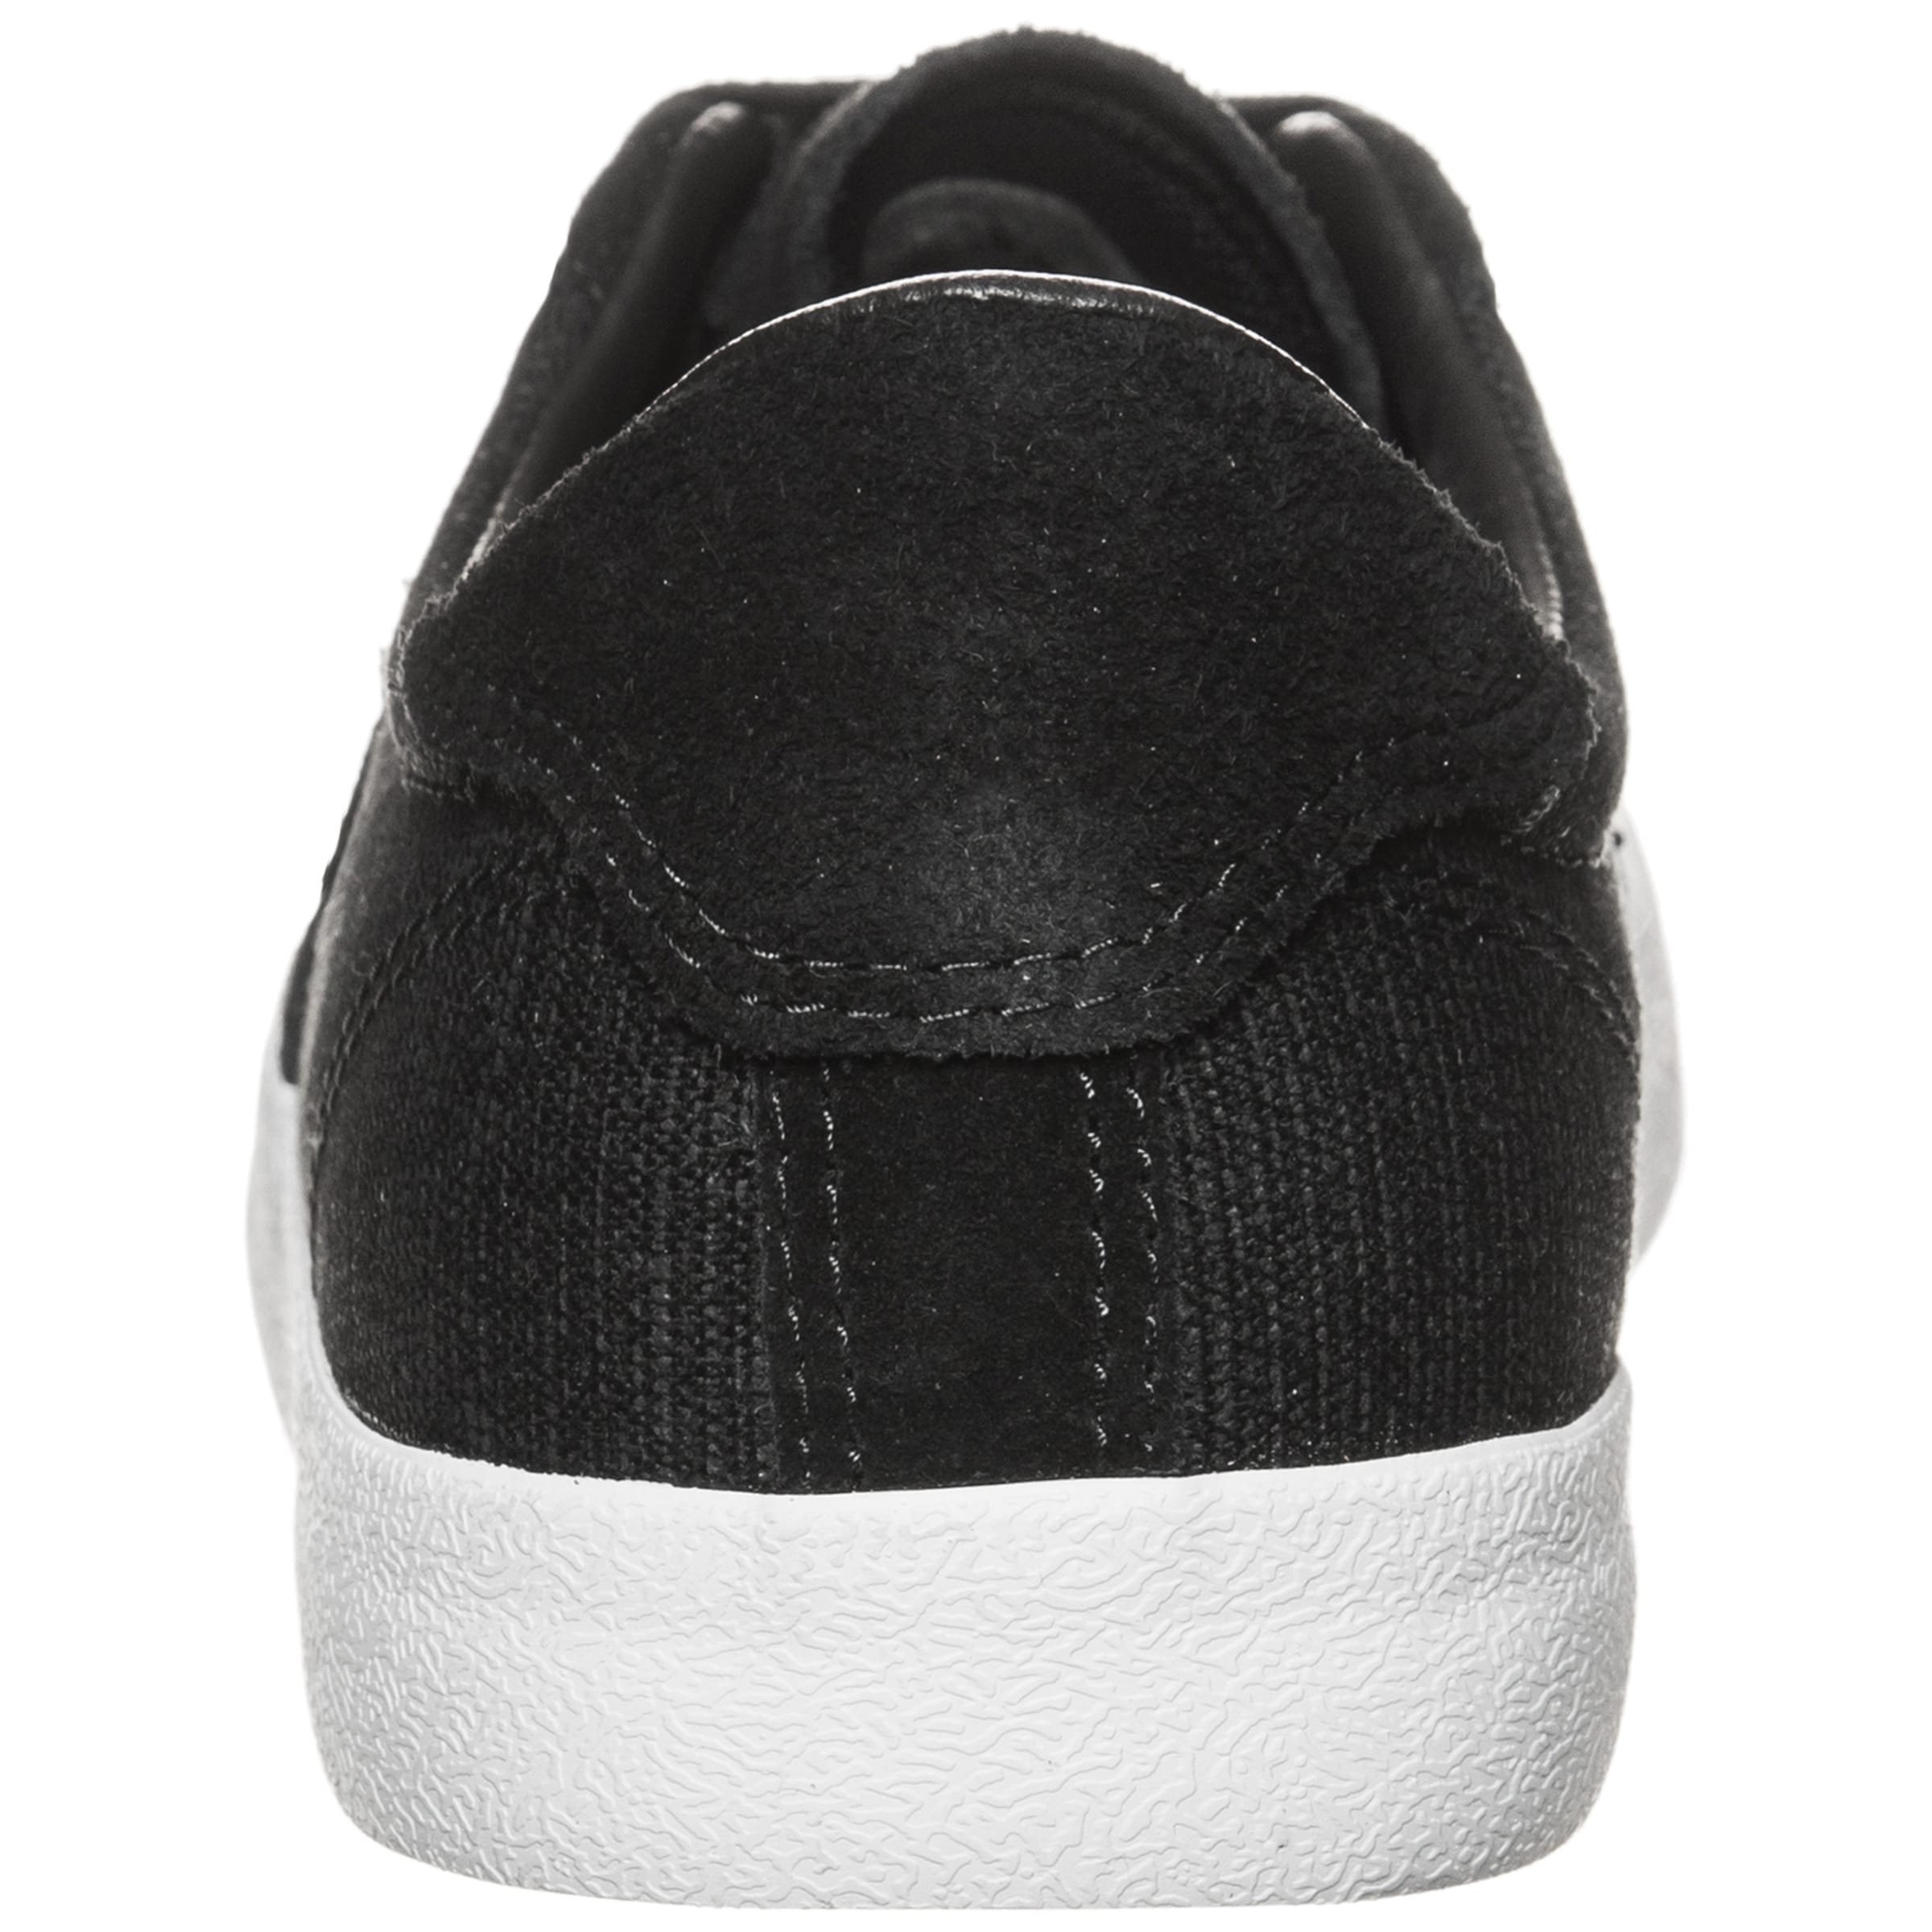 Spielraum Store CONVERSE 'Cons Breakpoint OX' Sneaker Preiswerte Reale Finish Spielraum Extrem 05AU61Qs